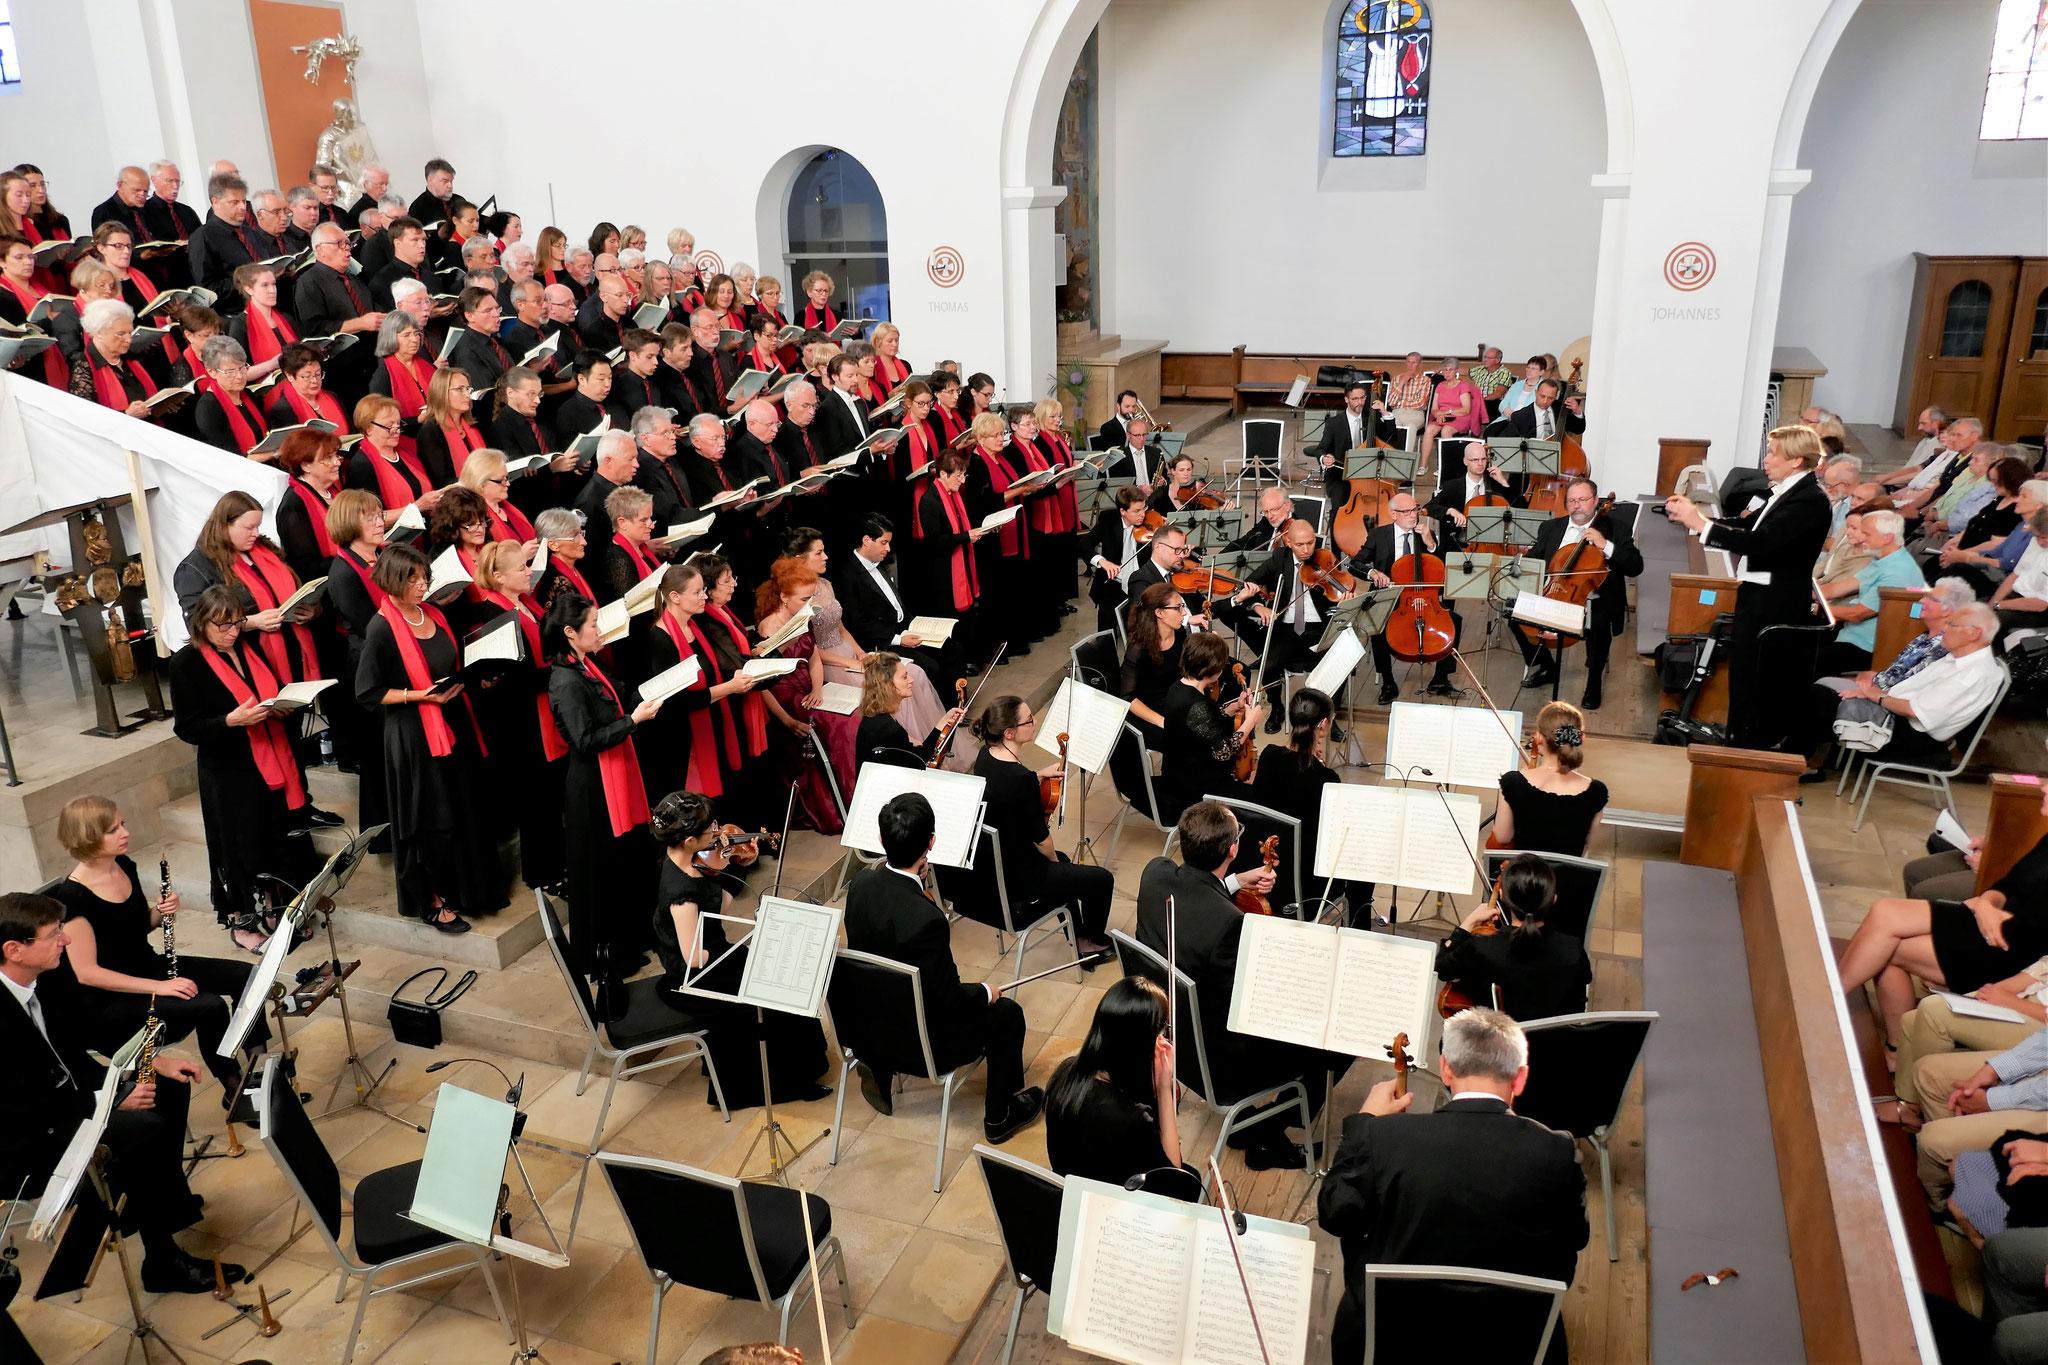 2018 Mozart, Messe in c-Moll, St. Ludwig in Nürnberg